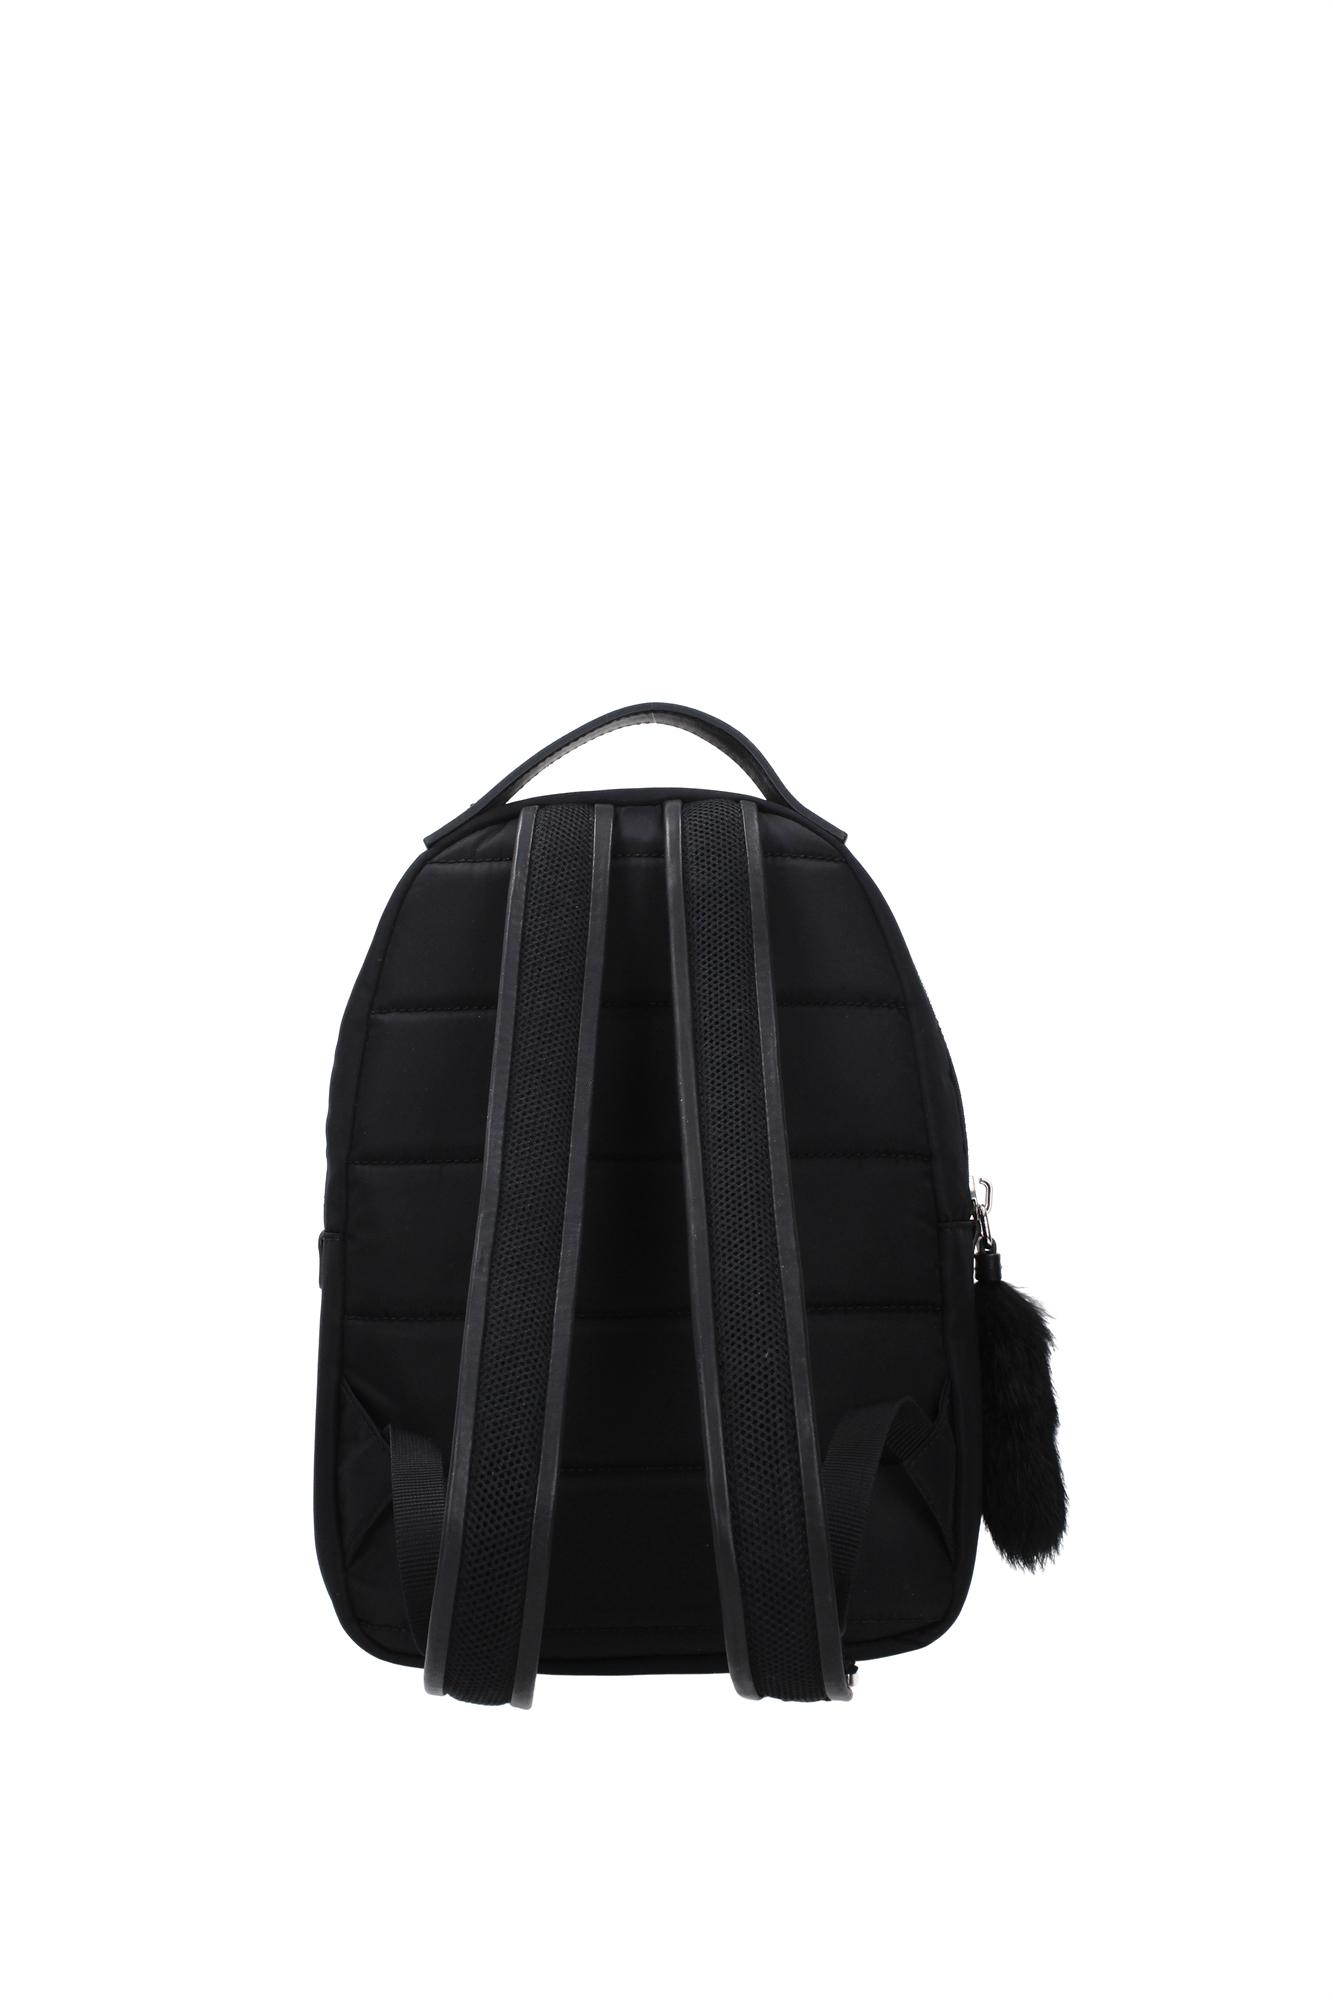 tasche rucksack moncler damen stoff schwarz. Black Bedroom Furniture Sets. Home Design Ideas